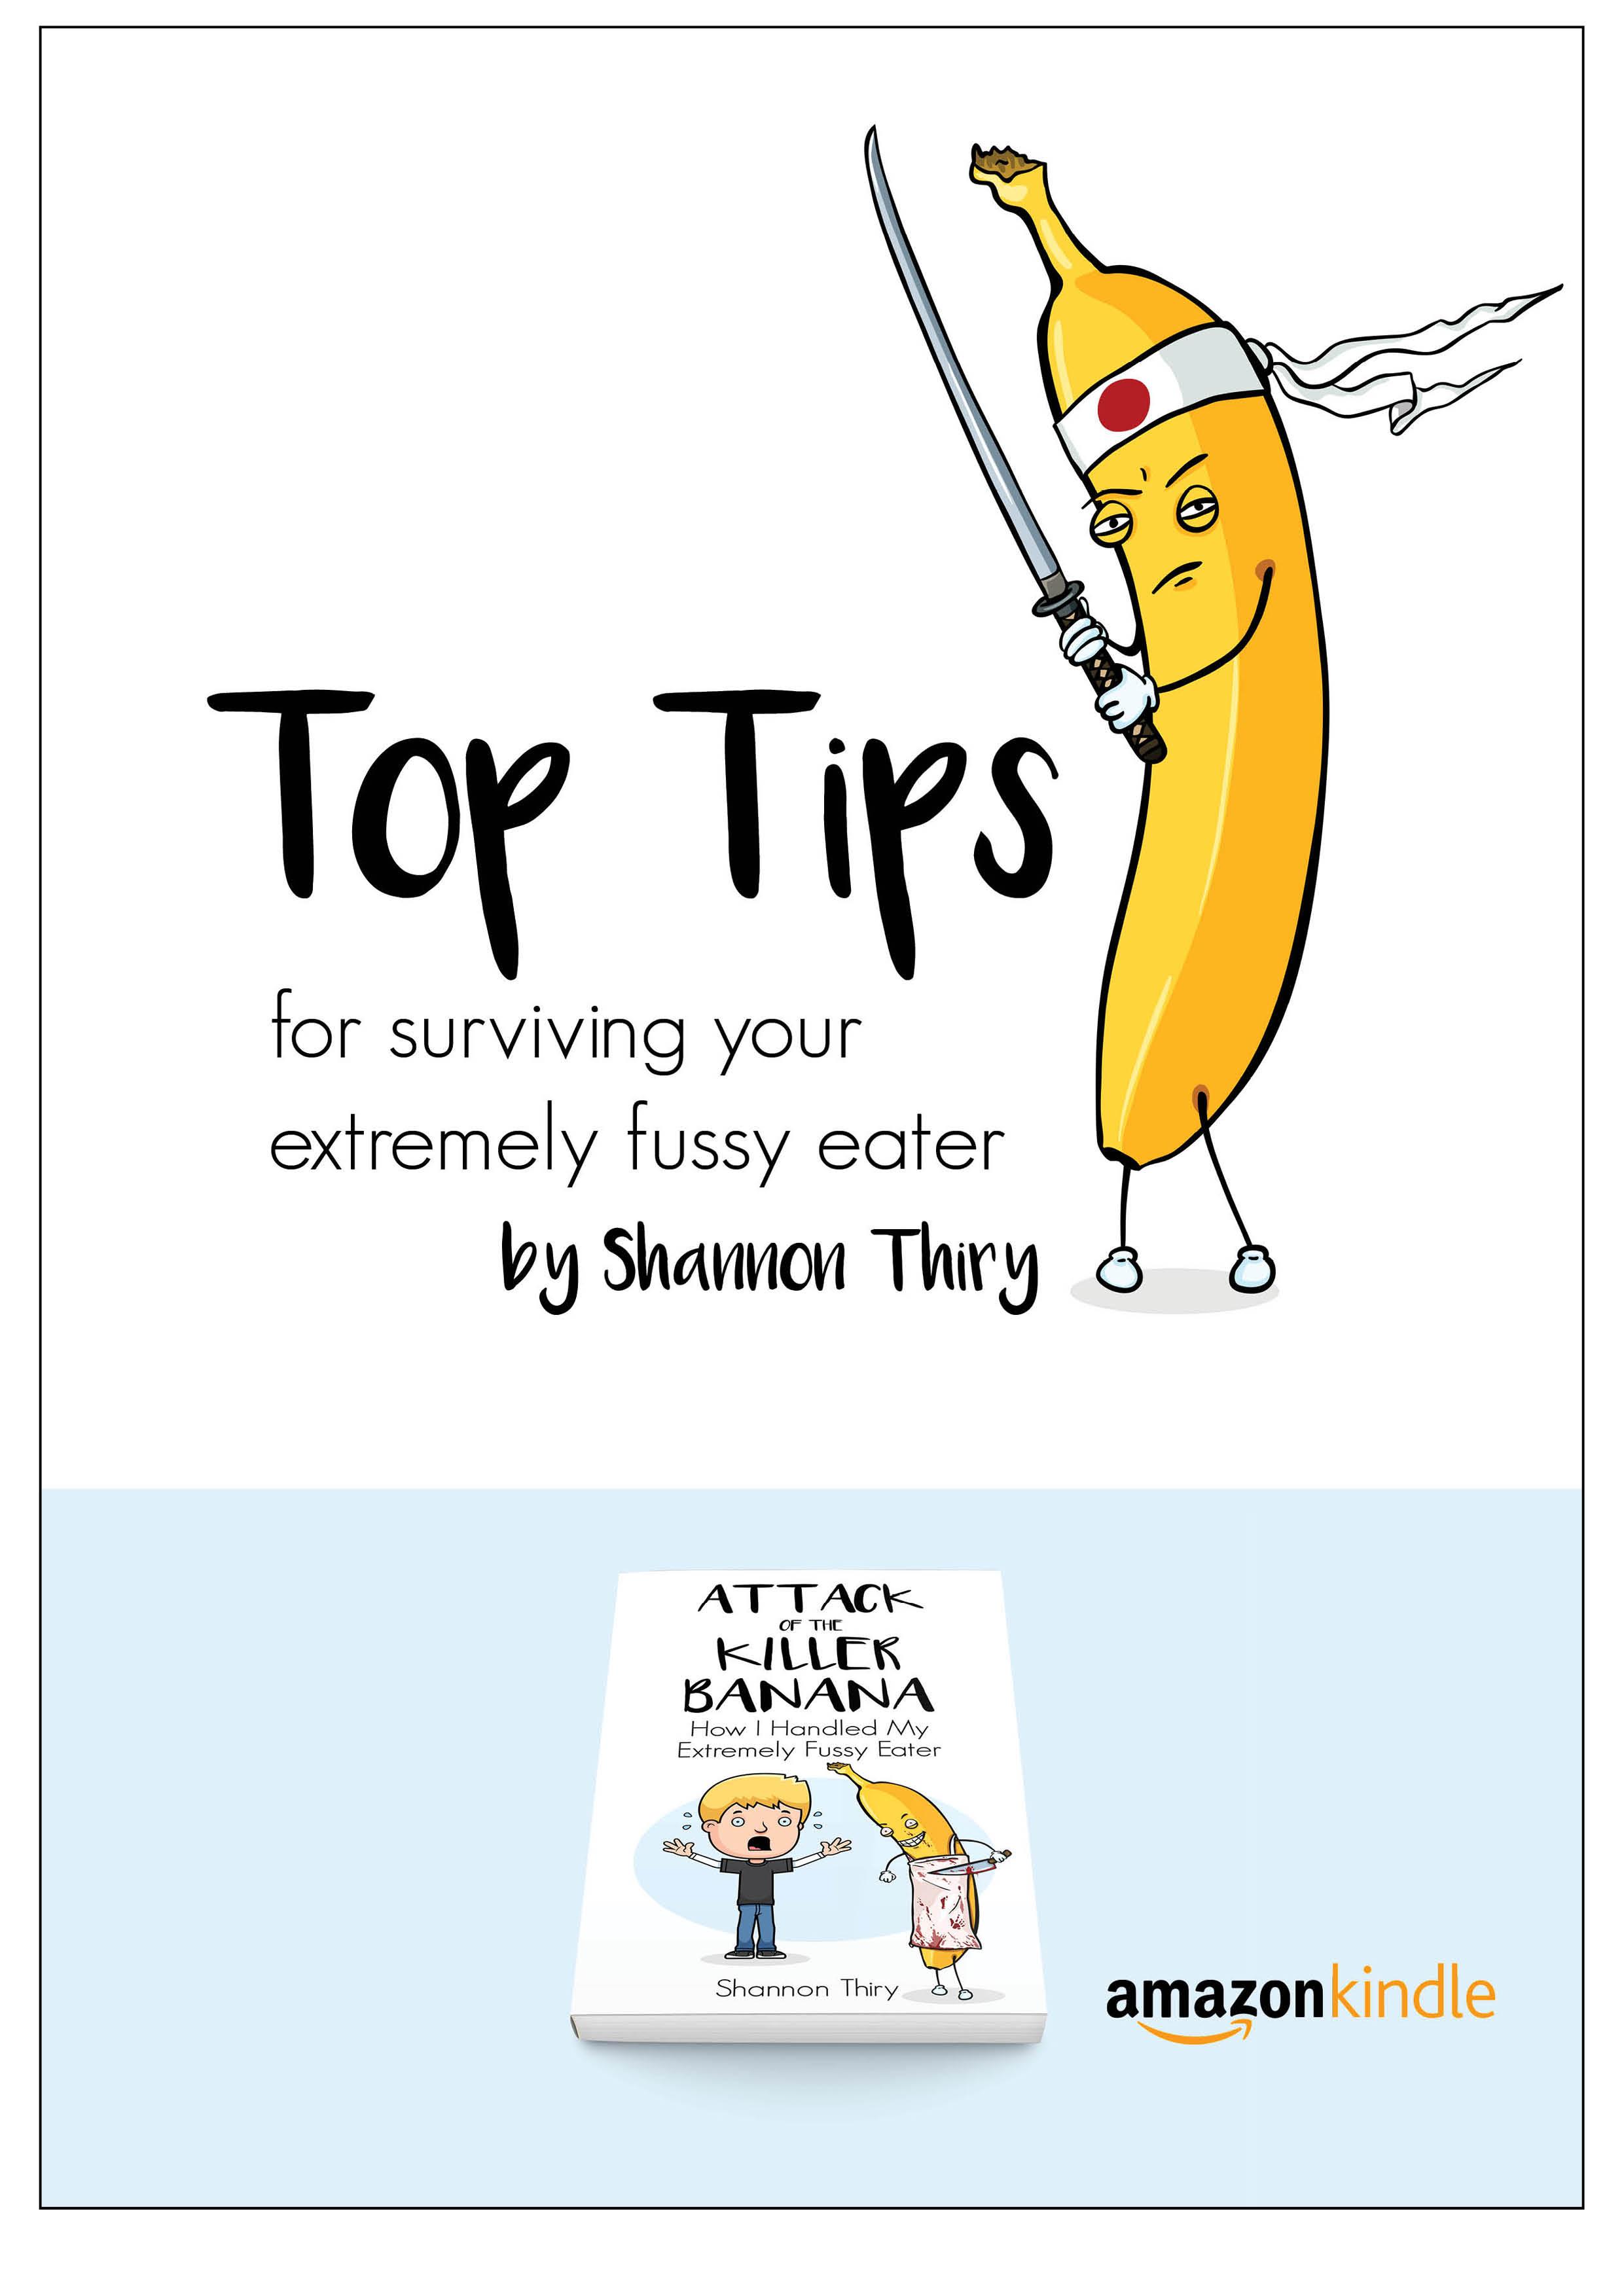 top tips graphic 2.jpg